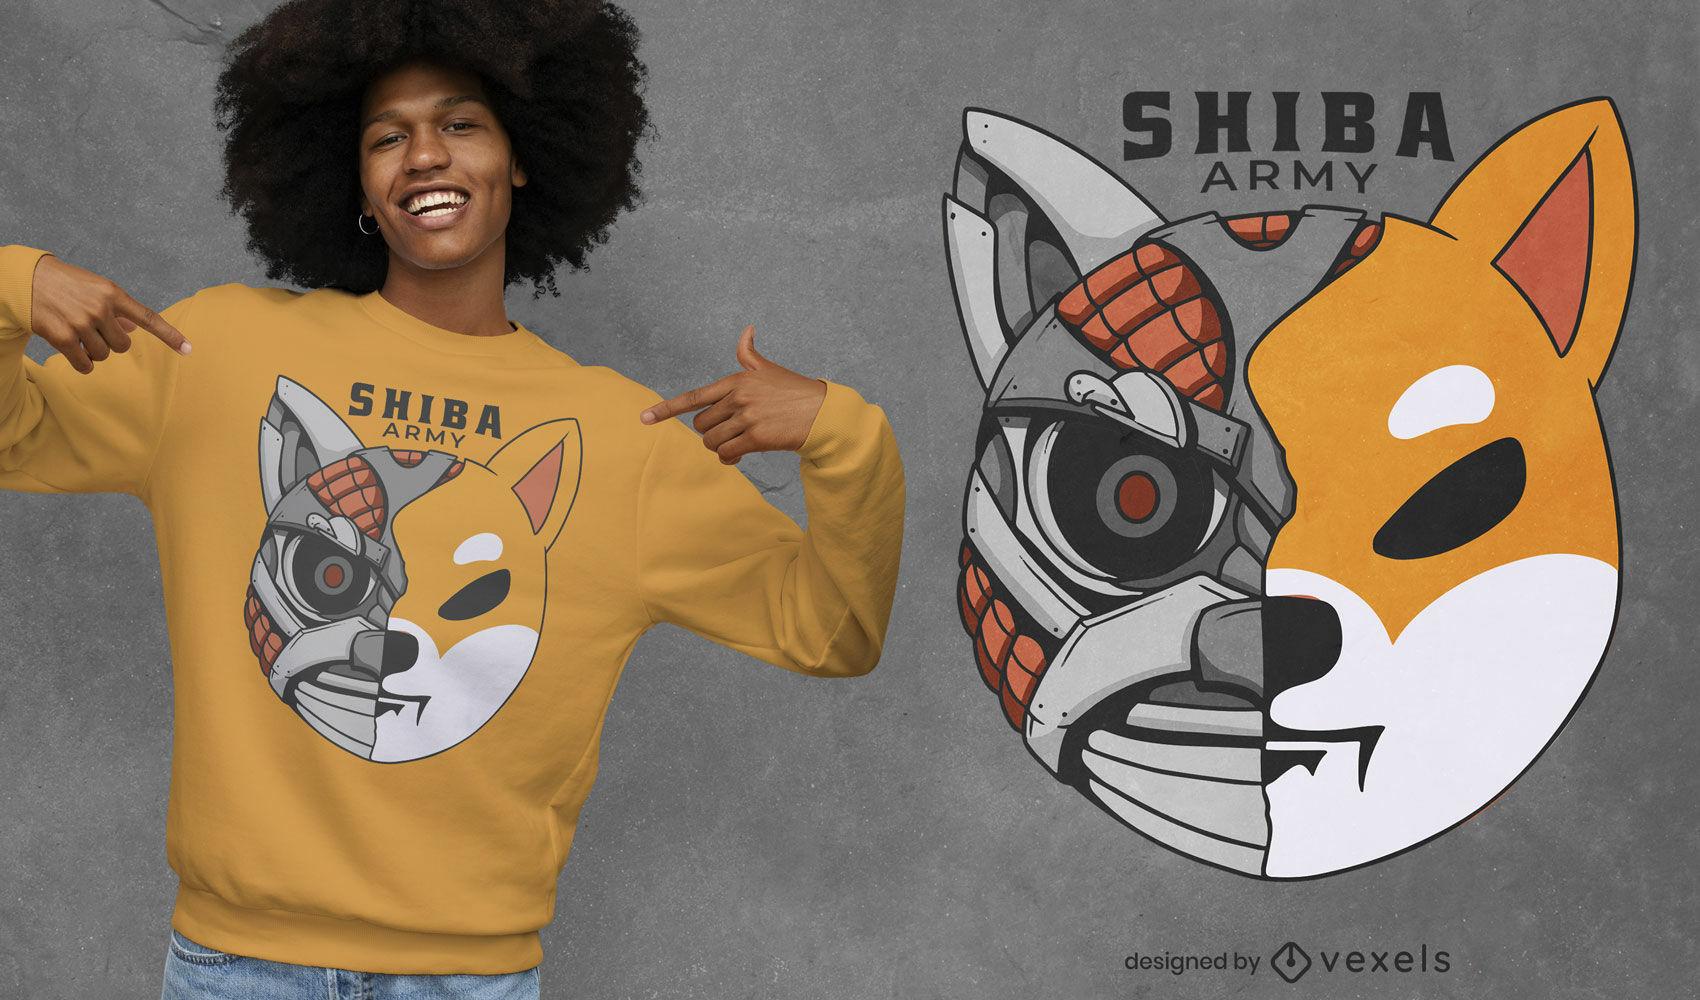 Diseño de camiseta de robot perro Shiba.